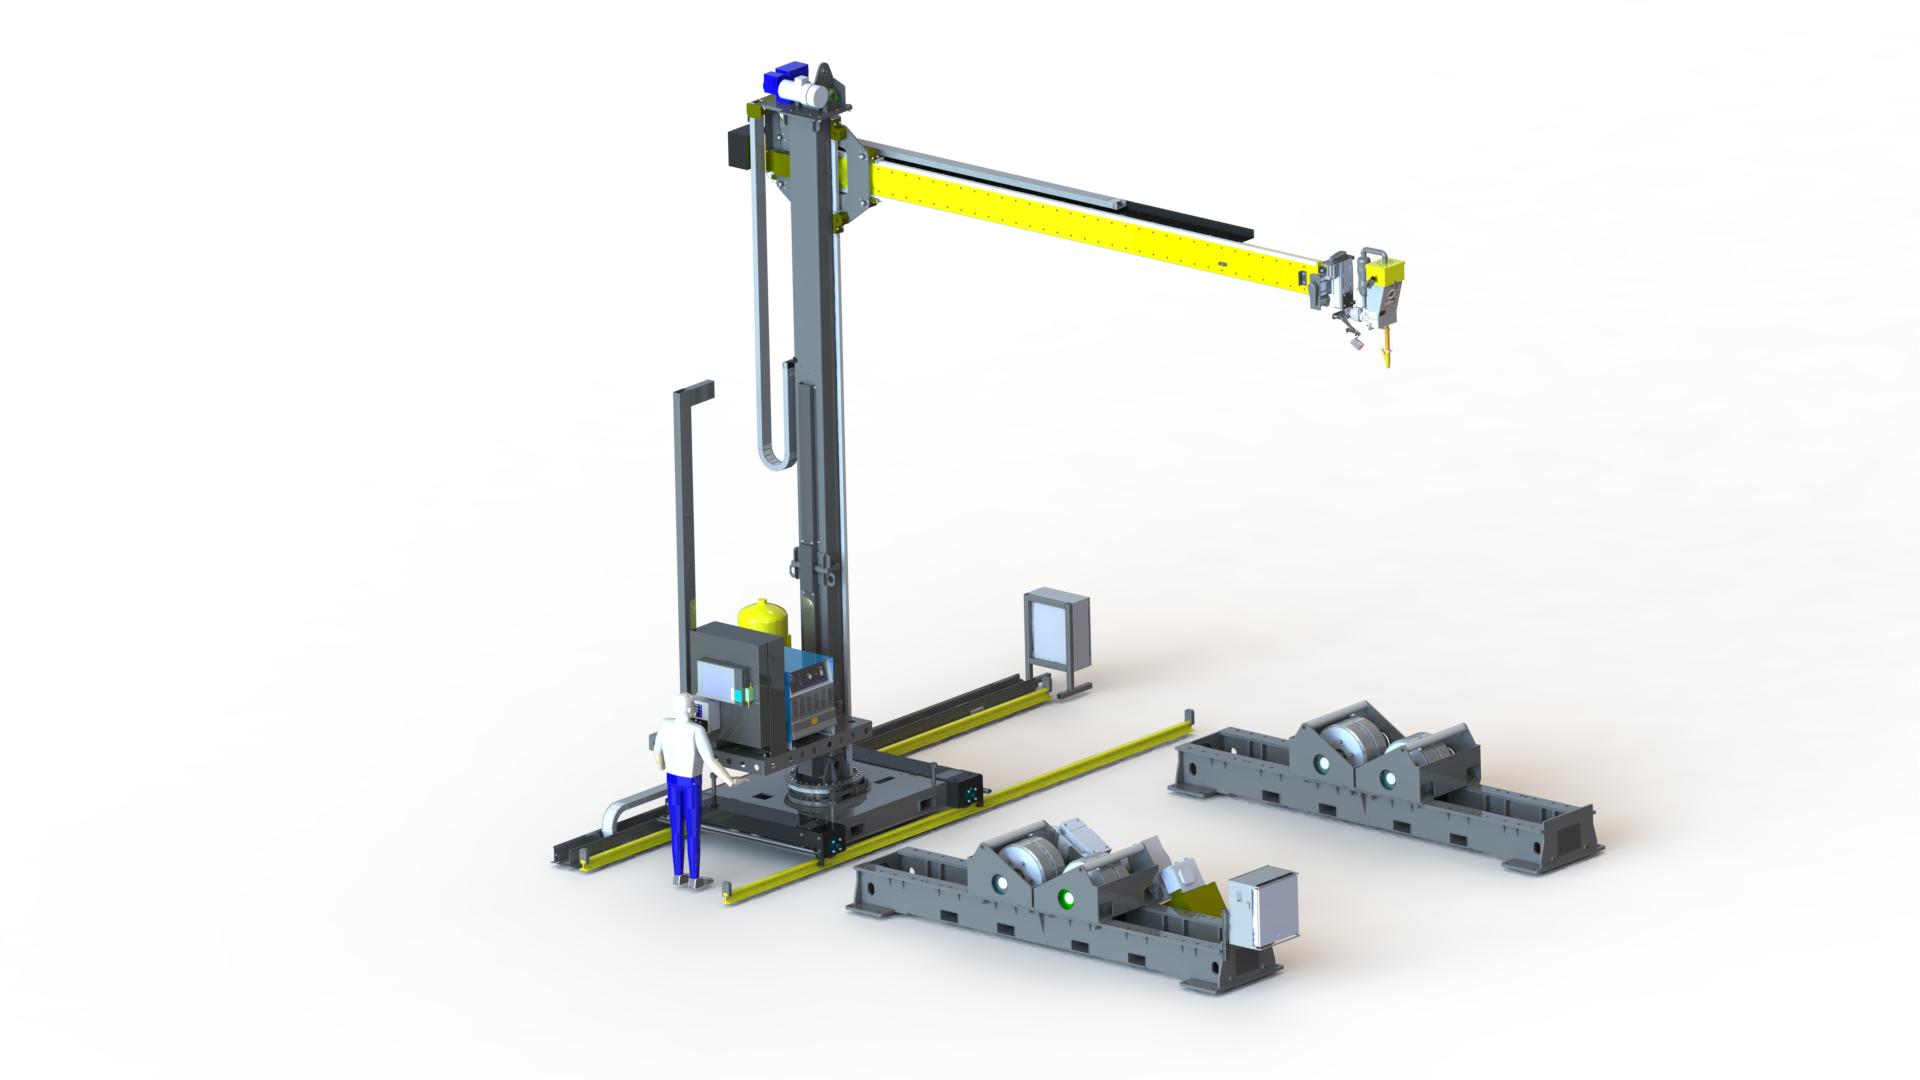 sumarc welding manipulator systems